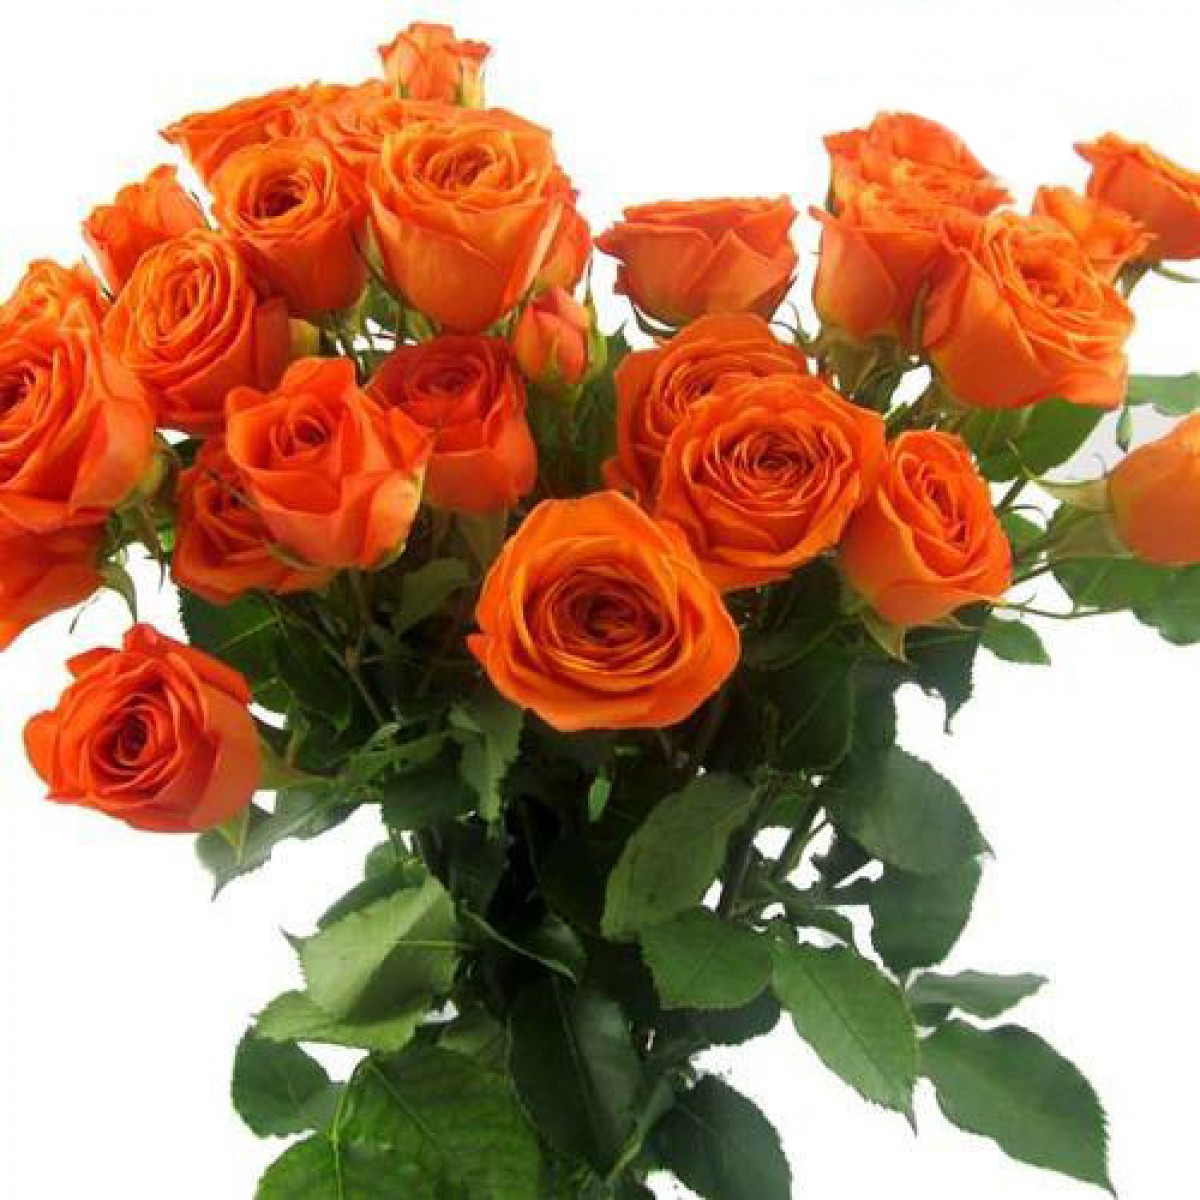 صوره صور ورد حلوه , احلى باقه صور من الورود